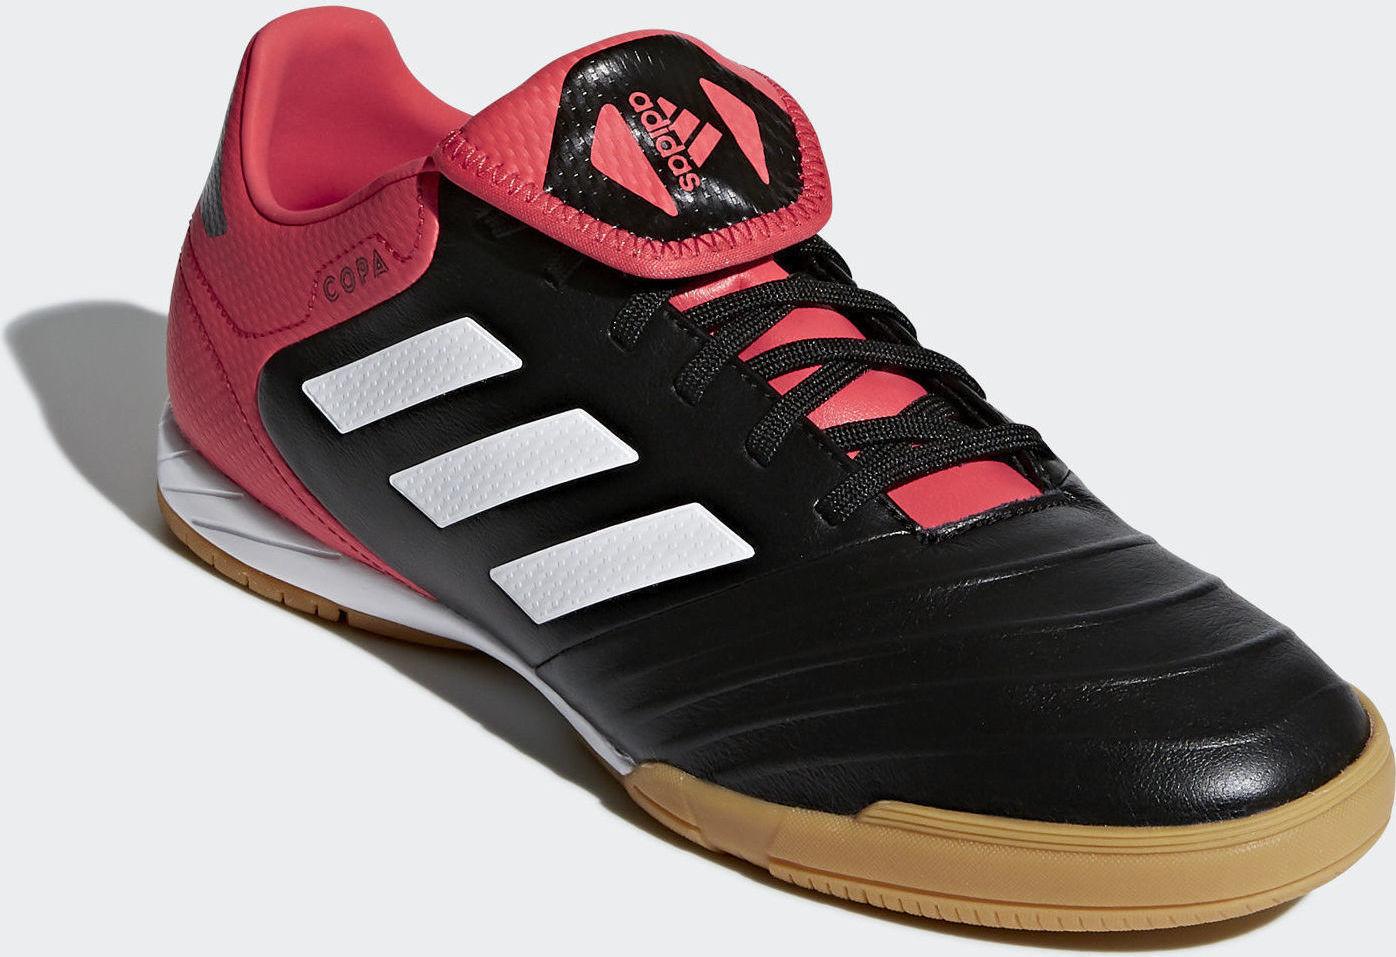 quality design 213c6 1a7c6 ... Adidas Copa Tango 18.3 IN CP9017 ...